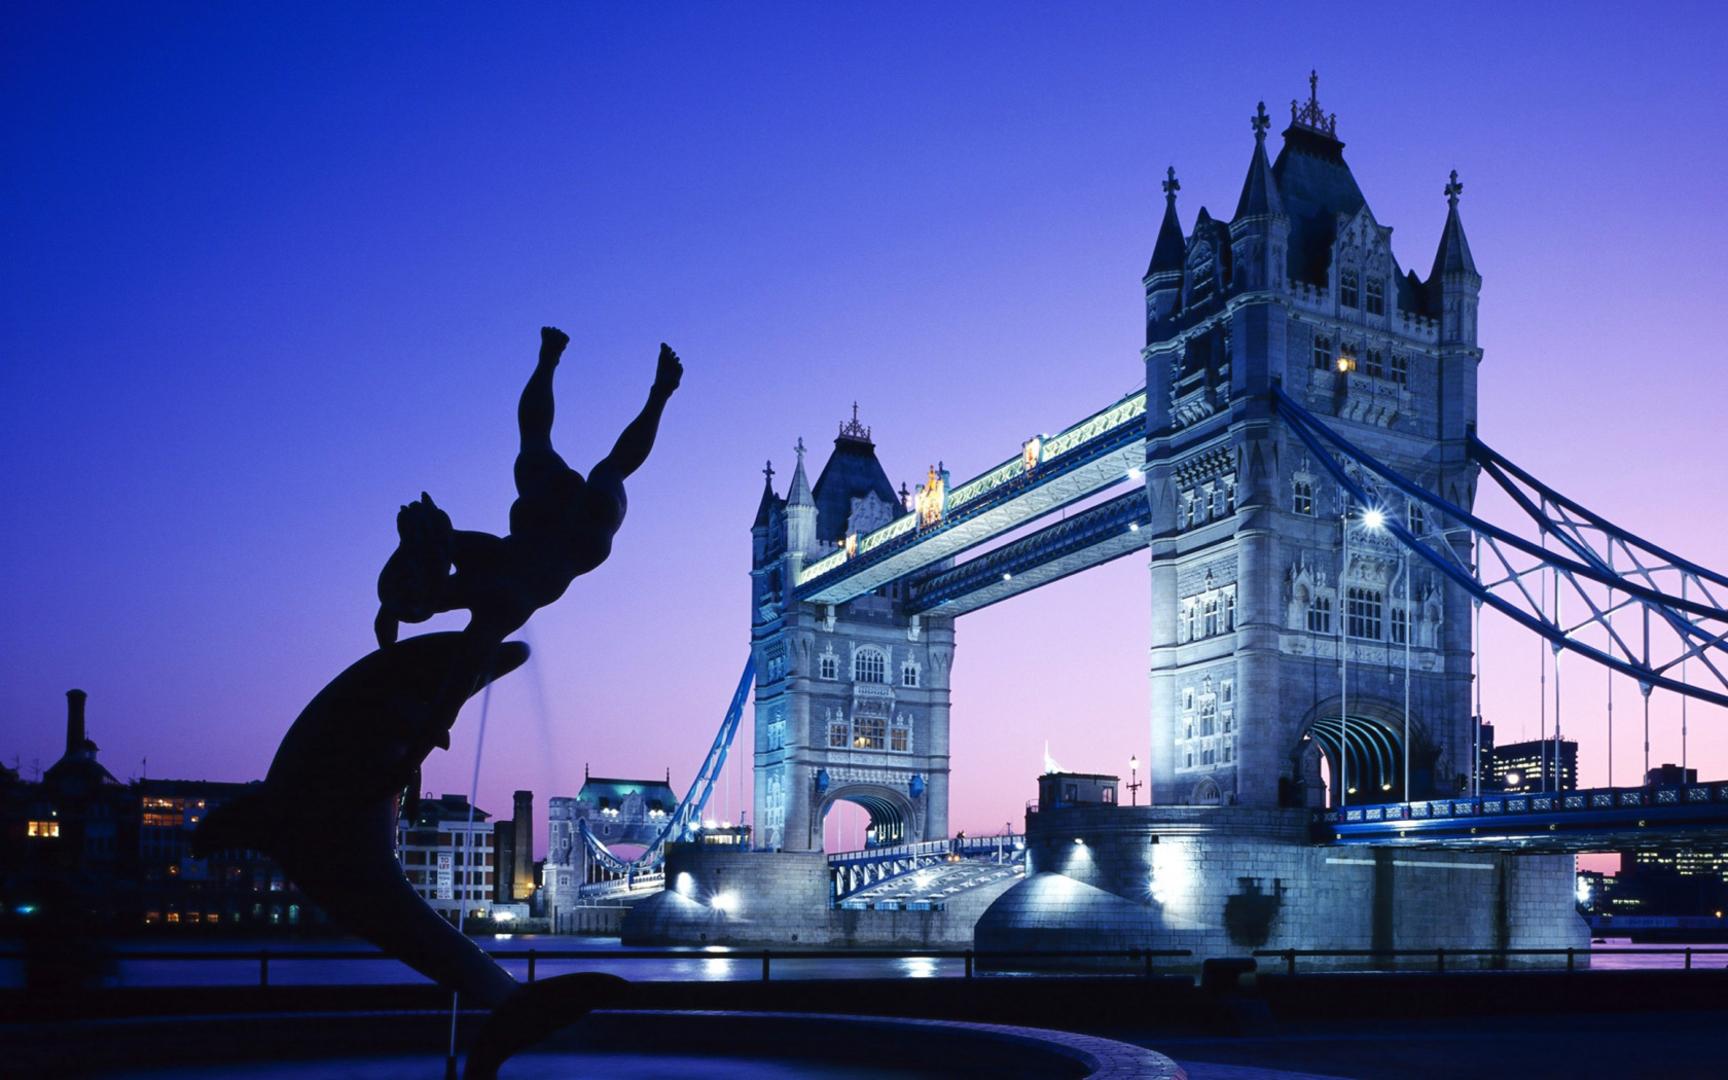 London Tower Bridge UK HD Wallpapers Unique HD Wallpapers 1728x1080